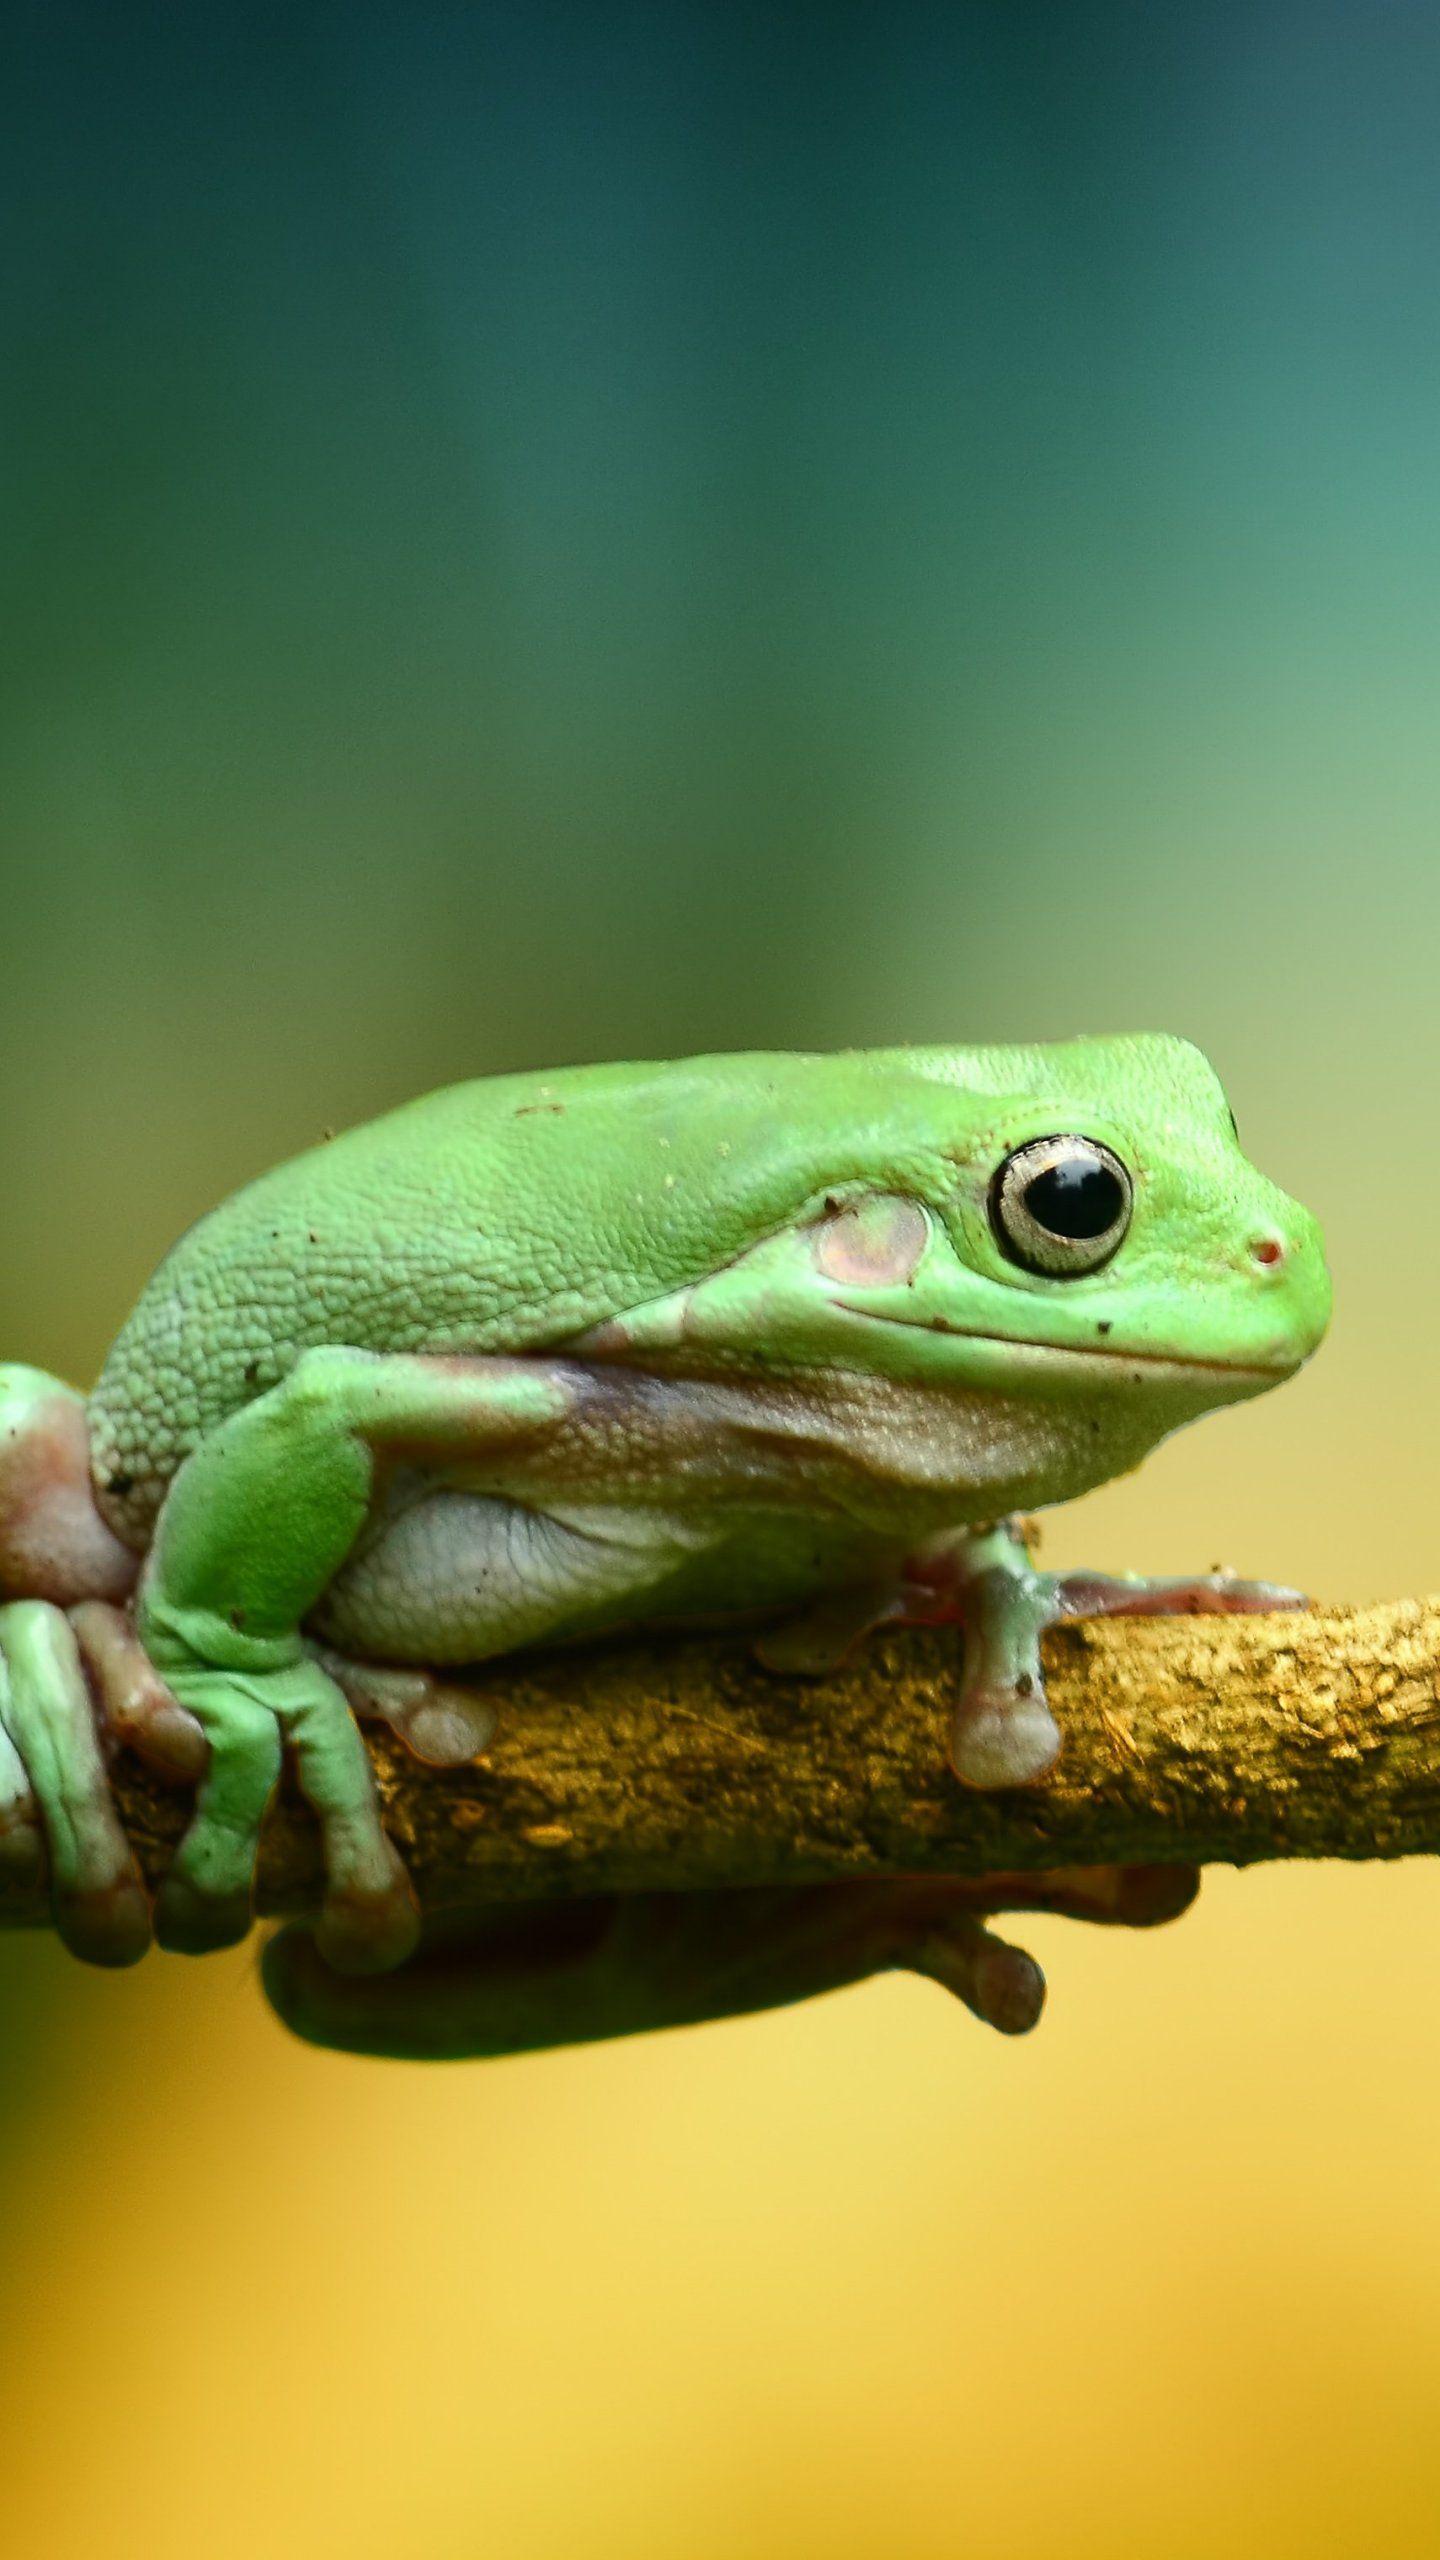 Green Frog Wallpaper Iphone Android Desktop Backgrounds Frog Wallpaper Mobile Wallpaper Wildlife Wallpaper